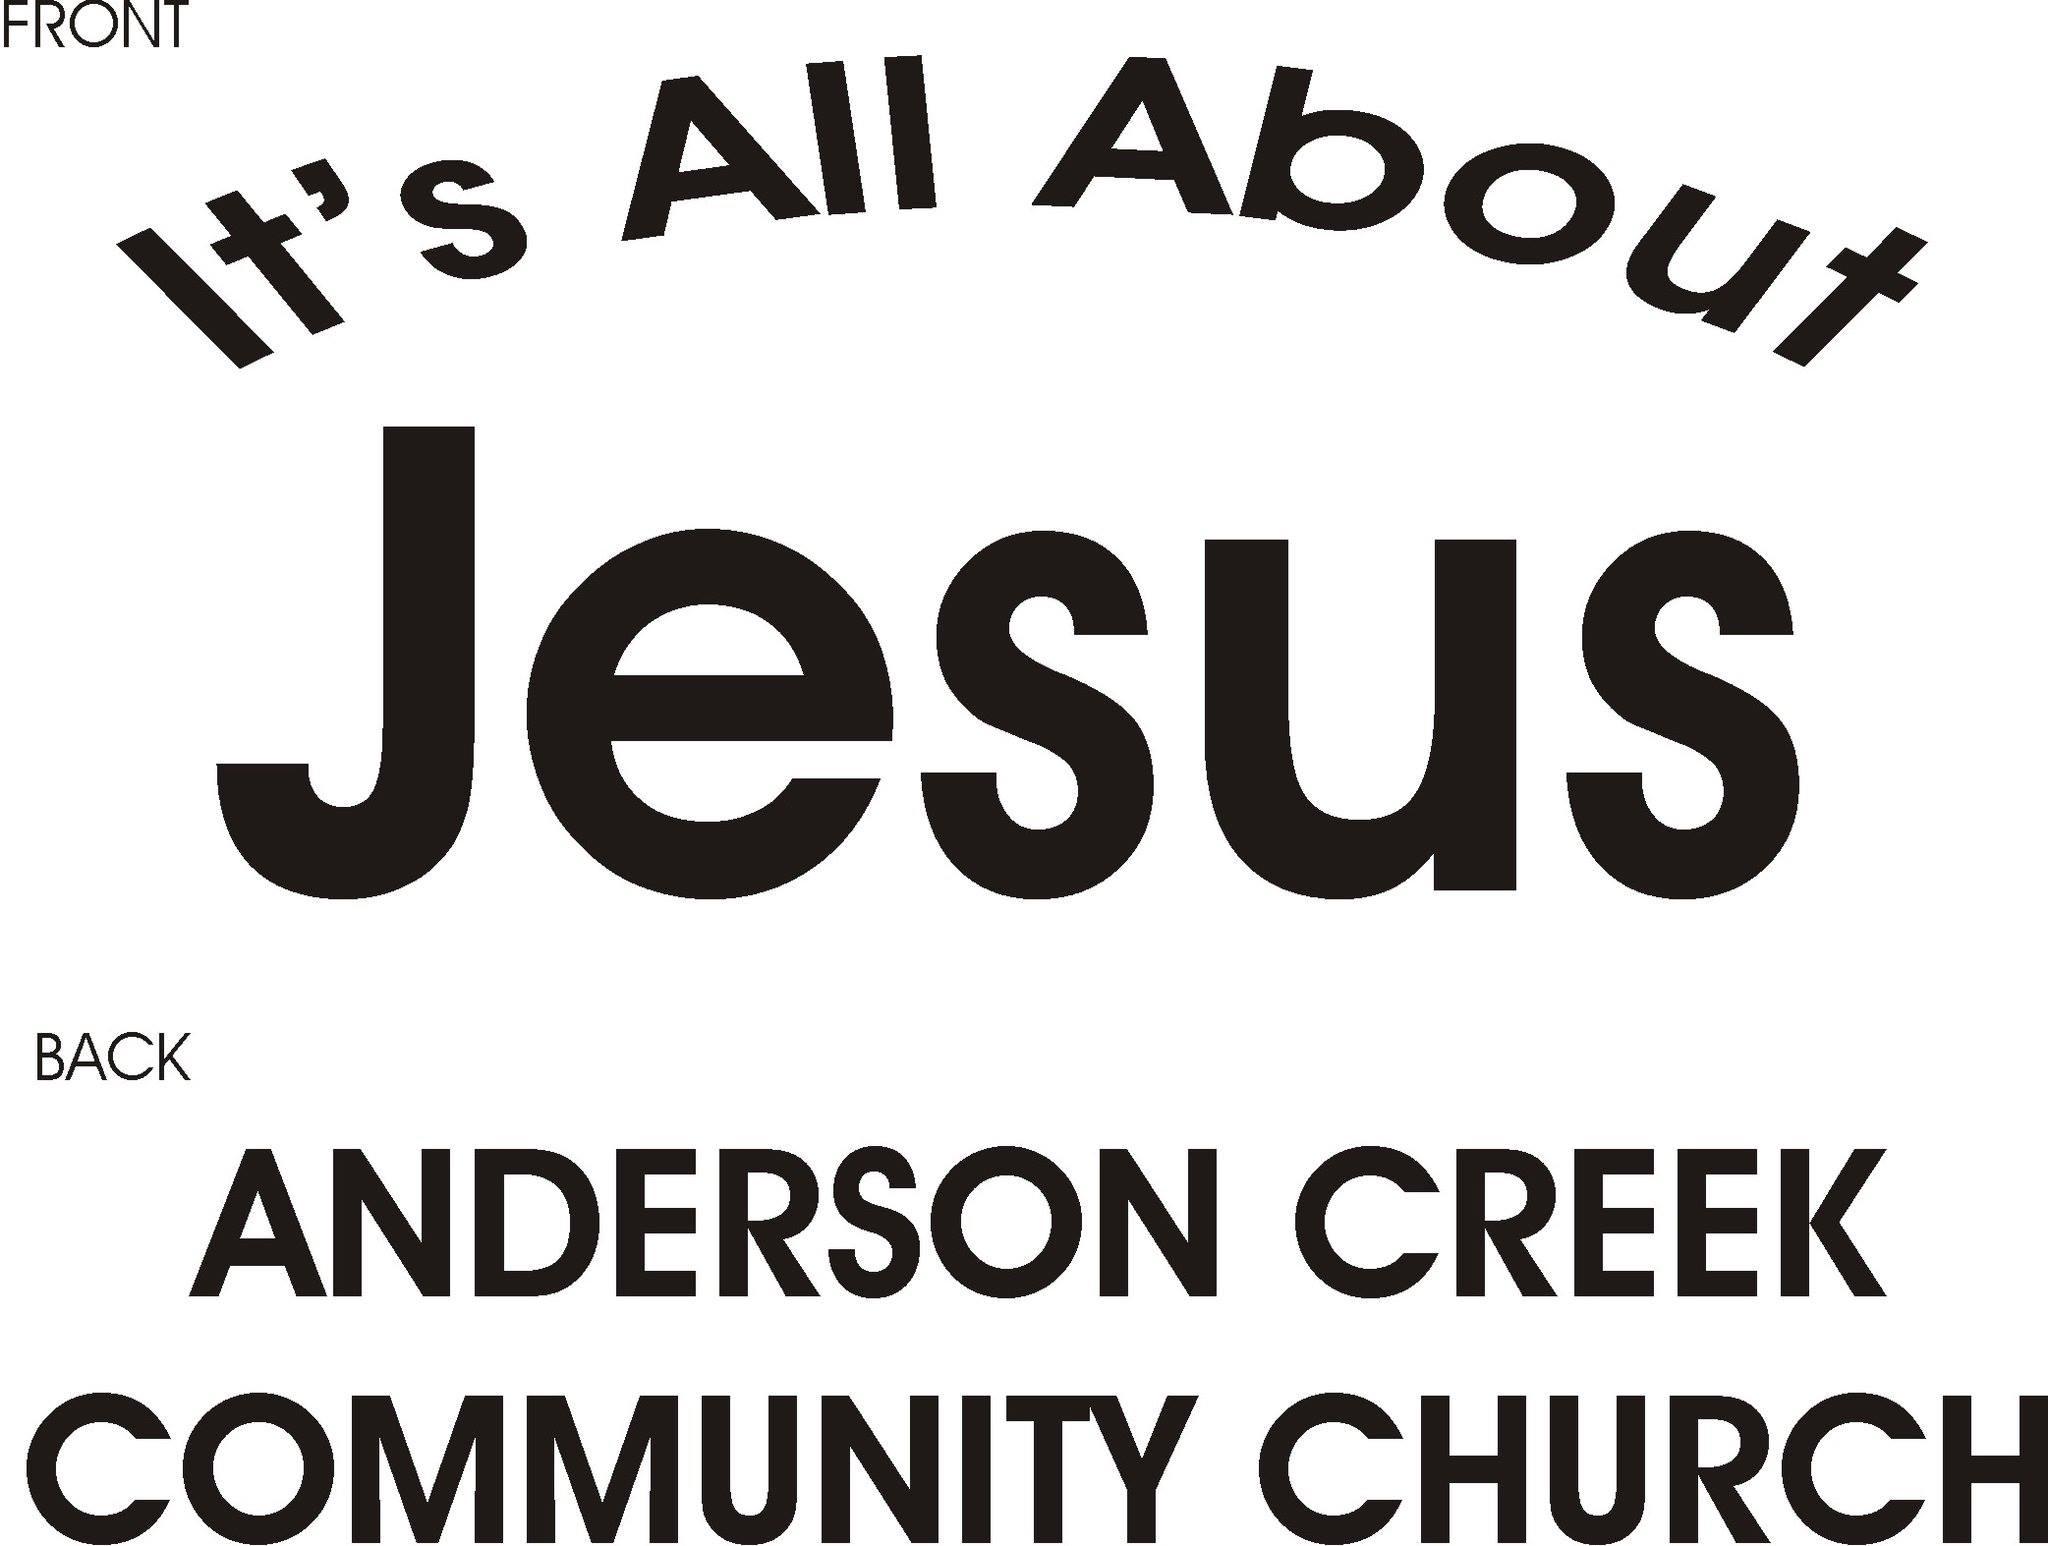 Anderson Creek Community Church